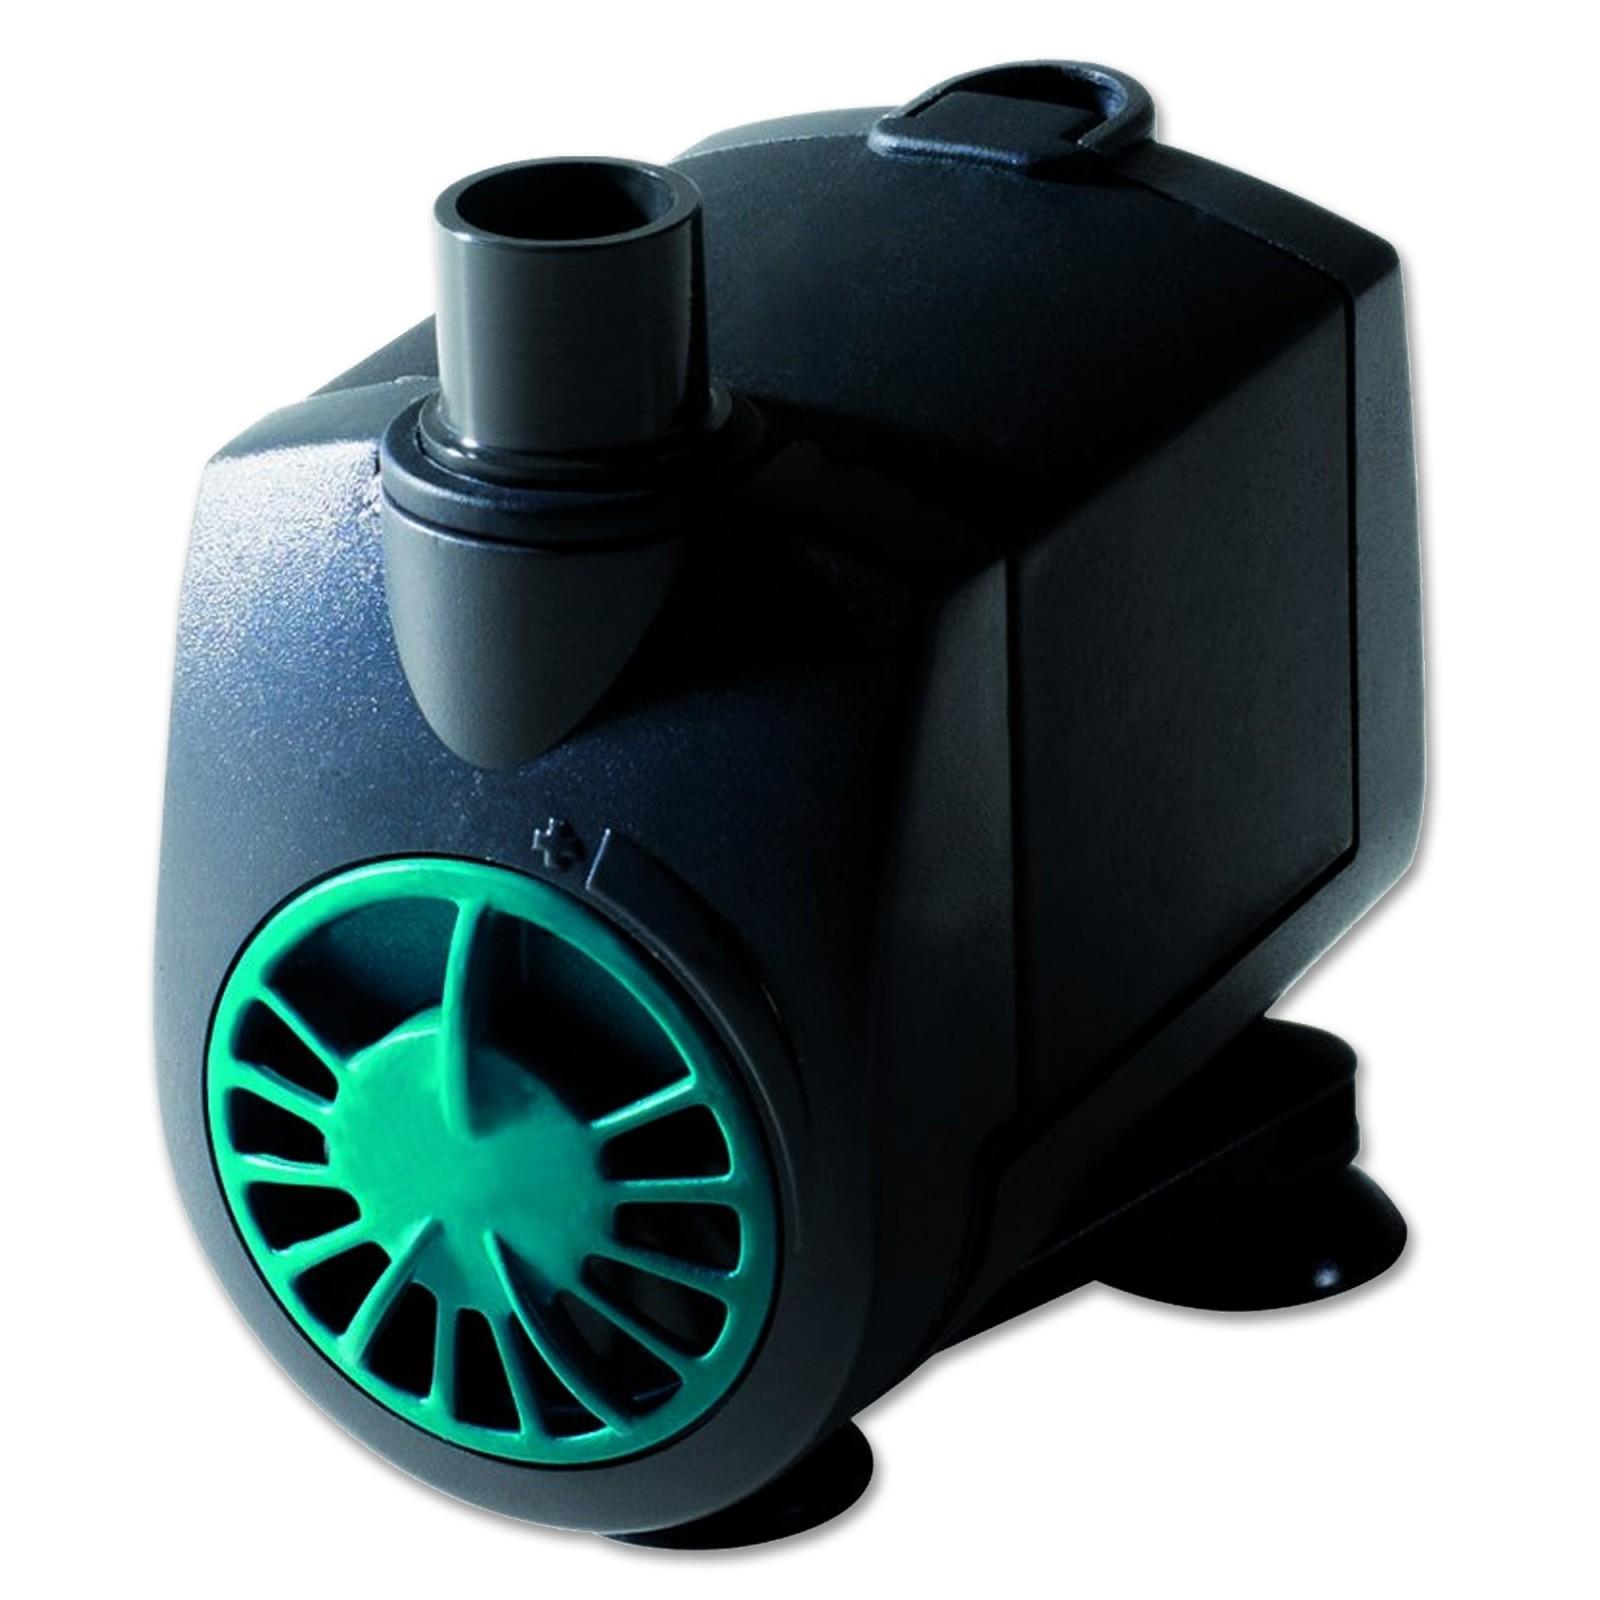 Newa jet nj 600 pompa per acquari regolabile 200 600 lt for Pompa per acquario tartarughe